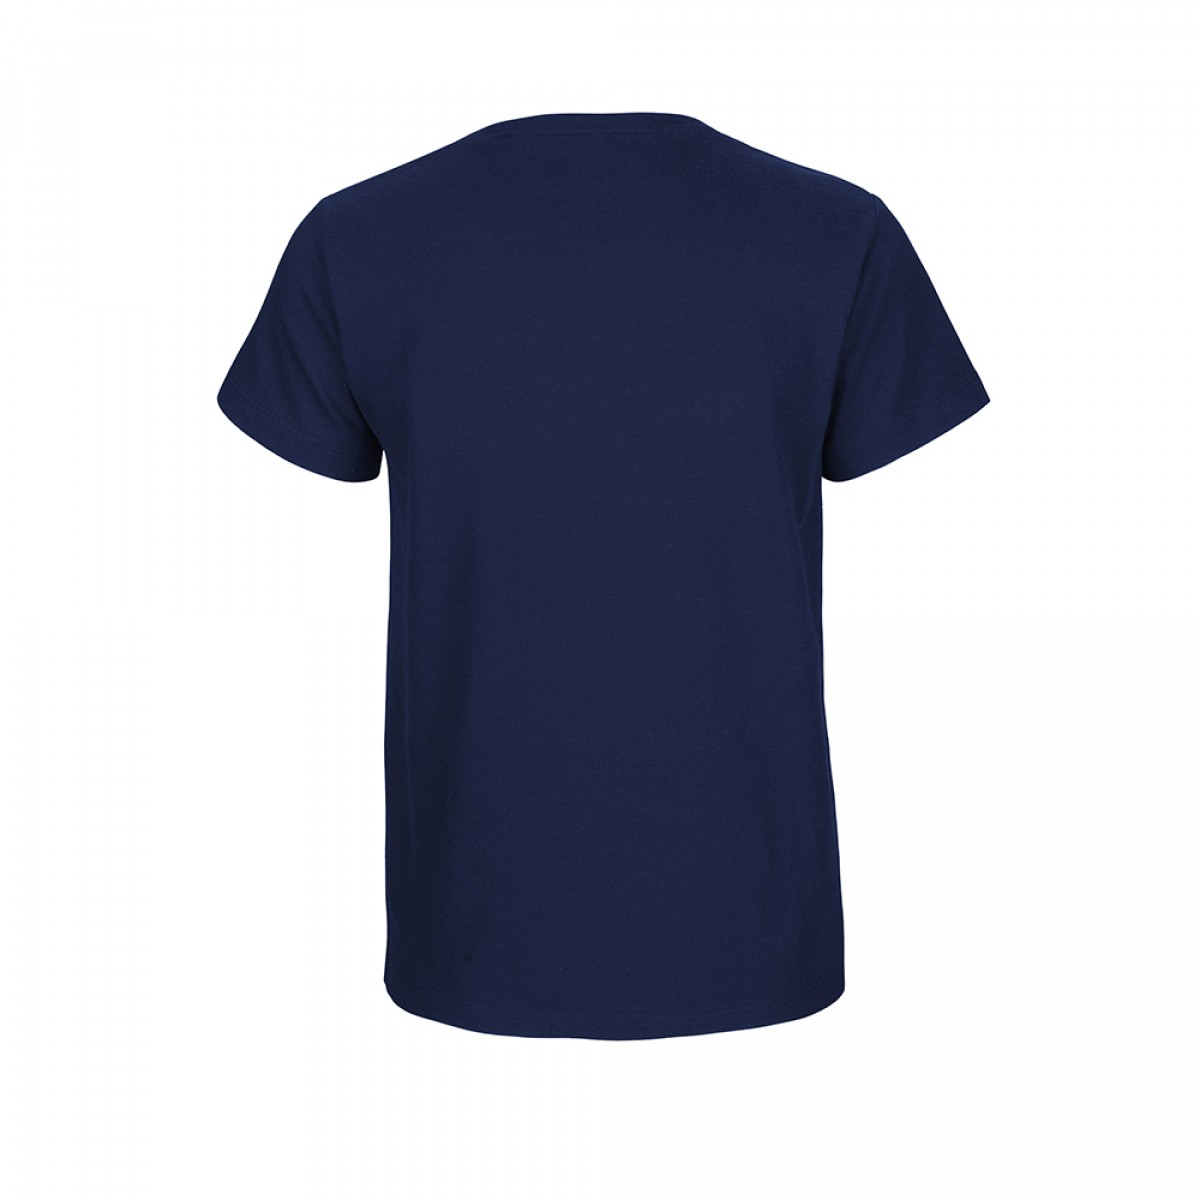 "Rapü Design Kindershirt ""Stinker"" navyblau   Fair Trade"